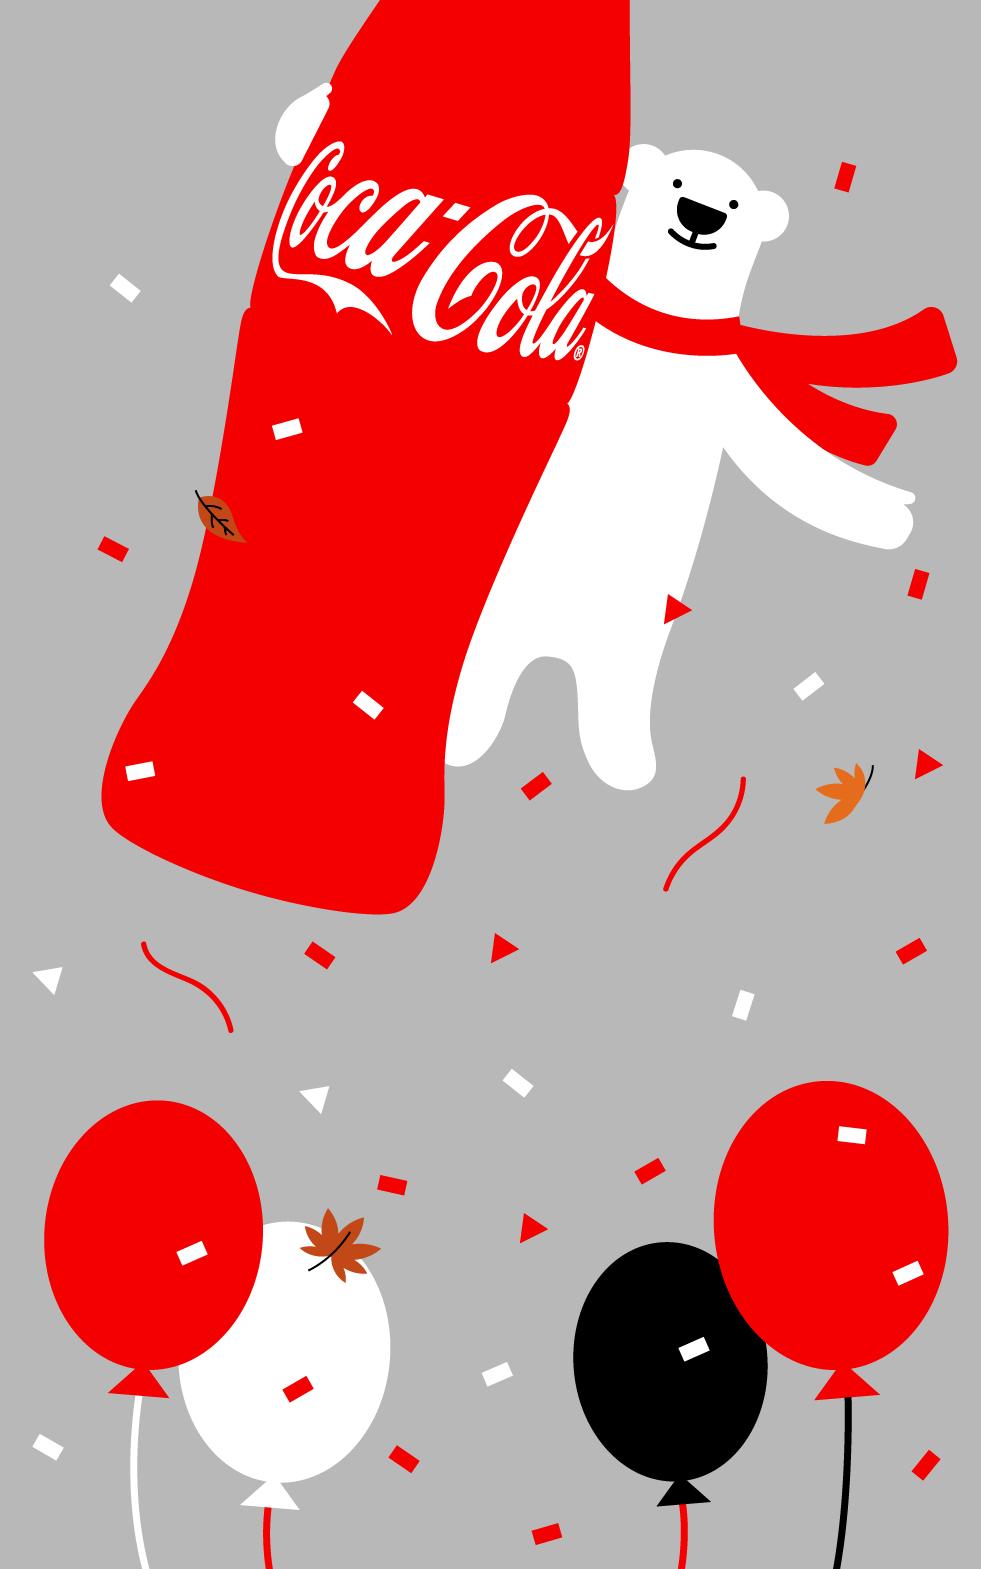 Coke_Thanksgiving_v14_ac_1 copy 8.jpg